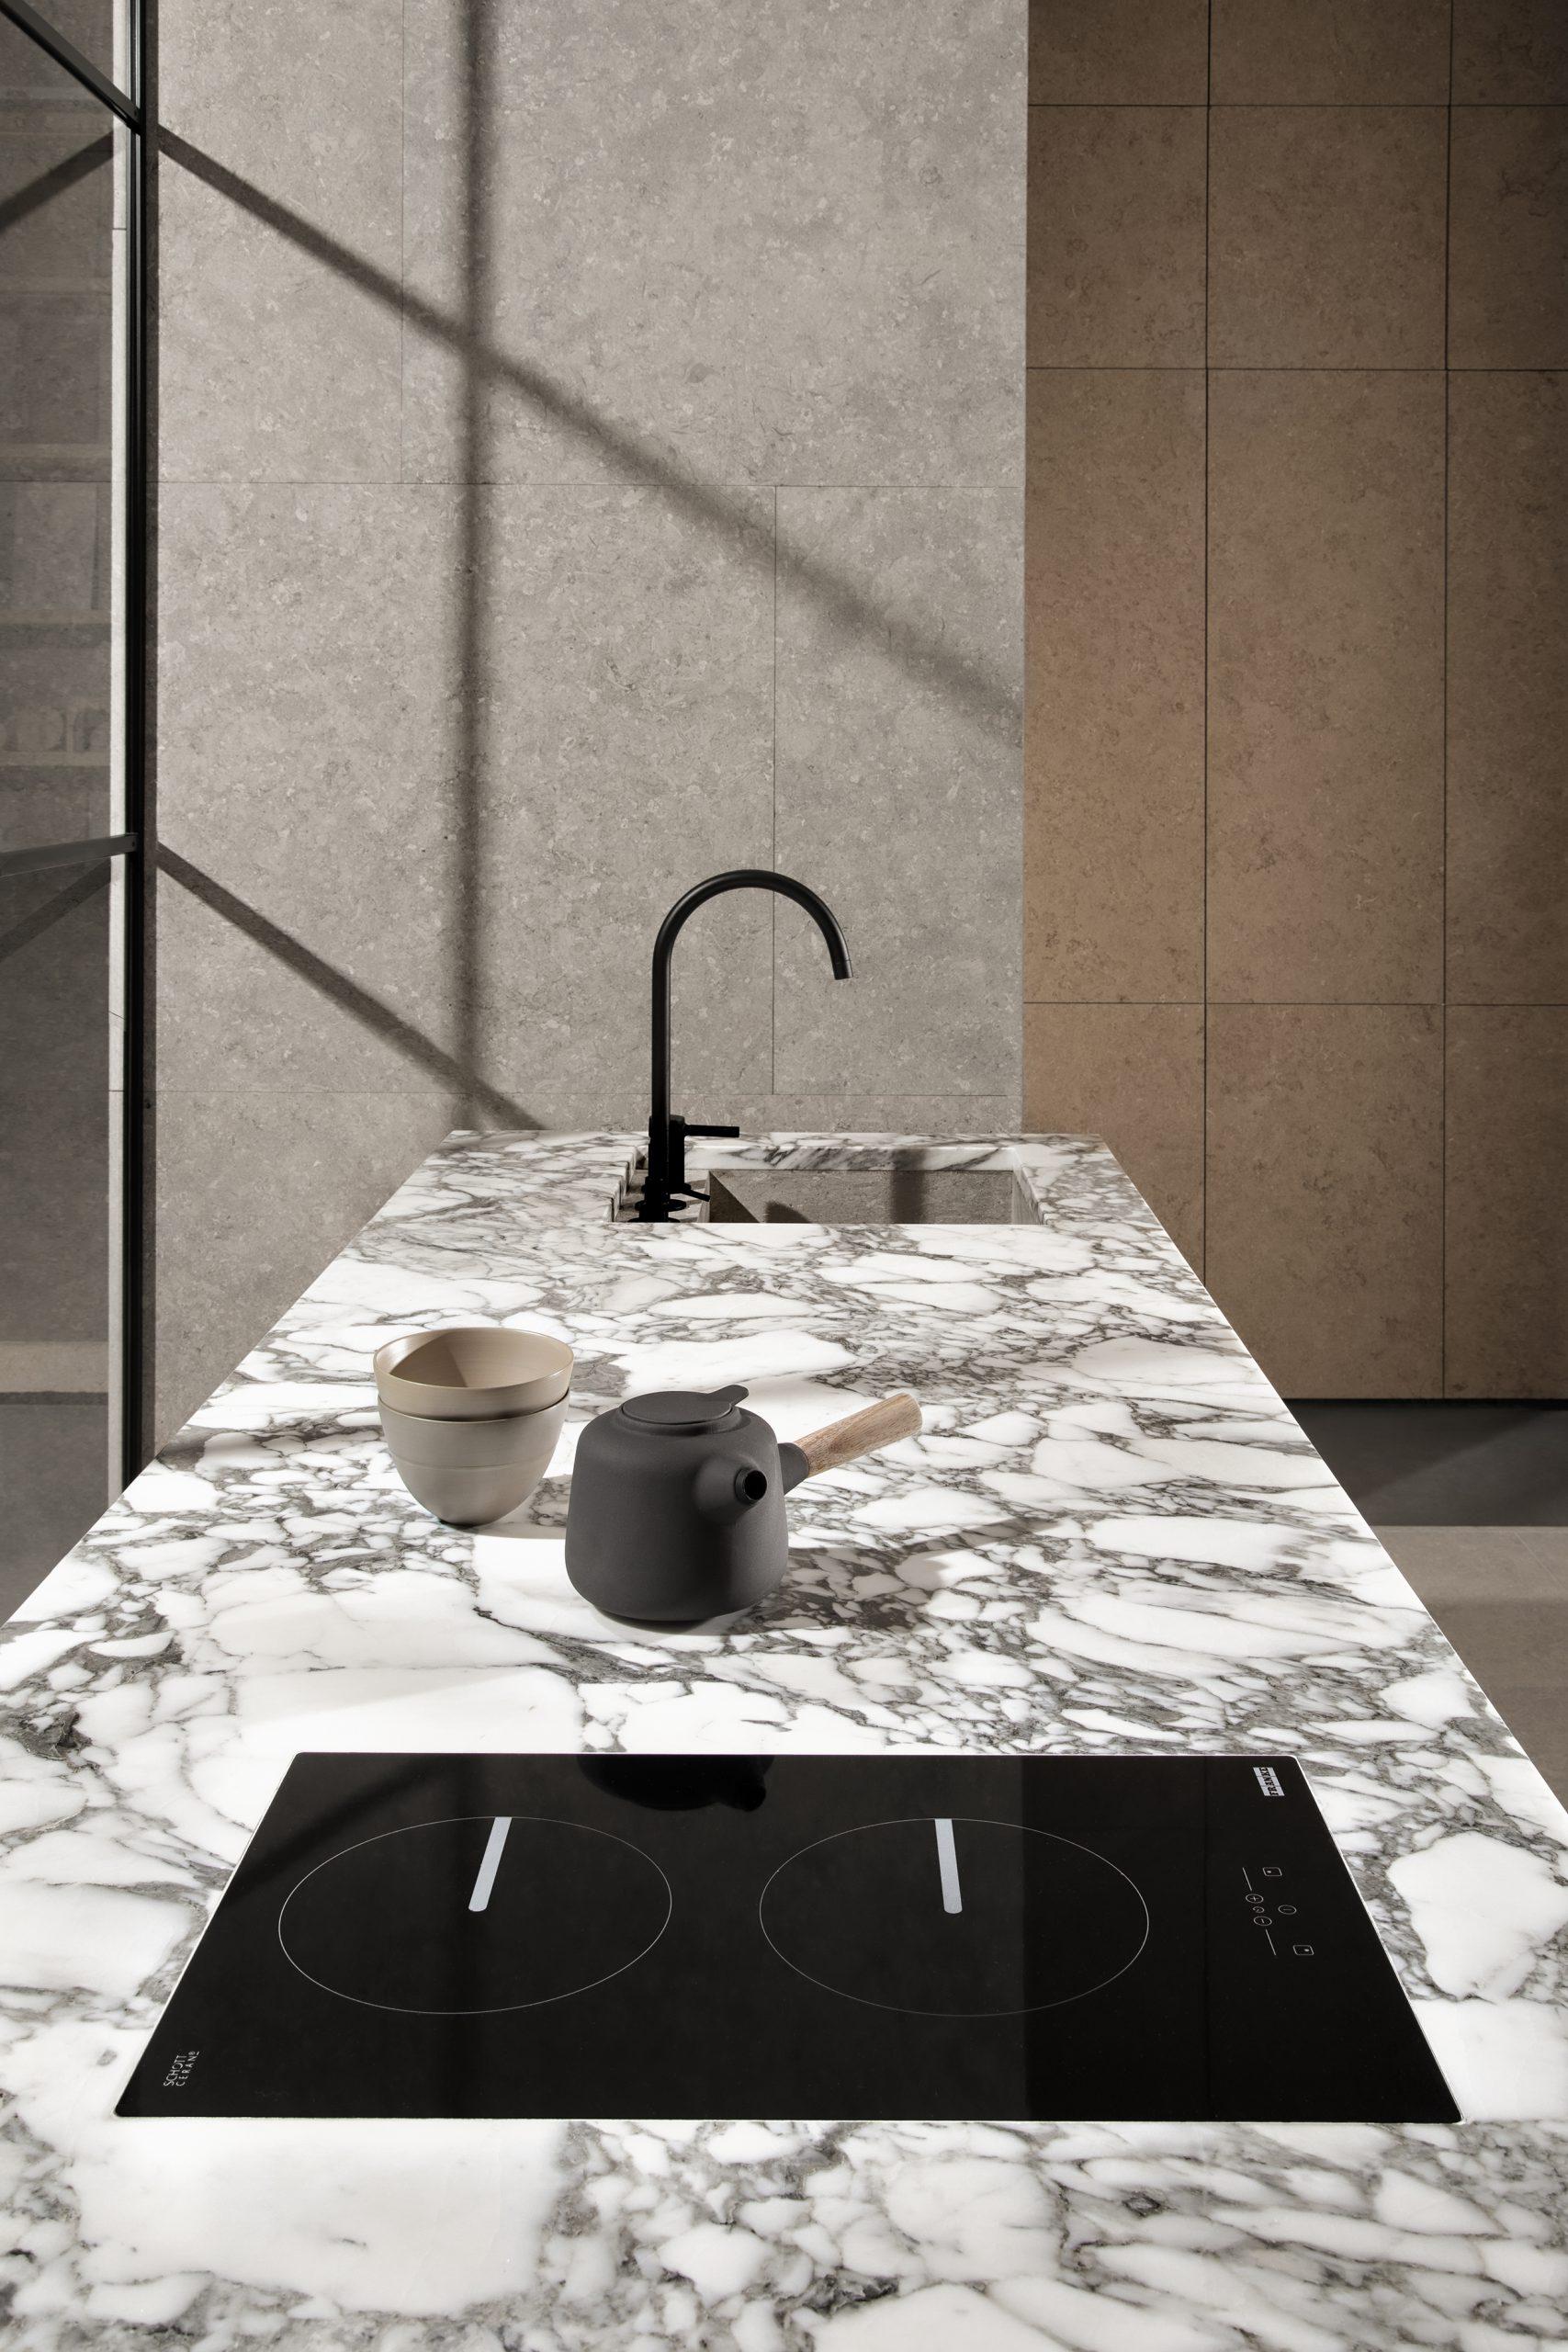 Kitchen detail in the Showroom Interior Design by Debiasi Sandri for Grassi Pietre